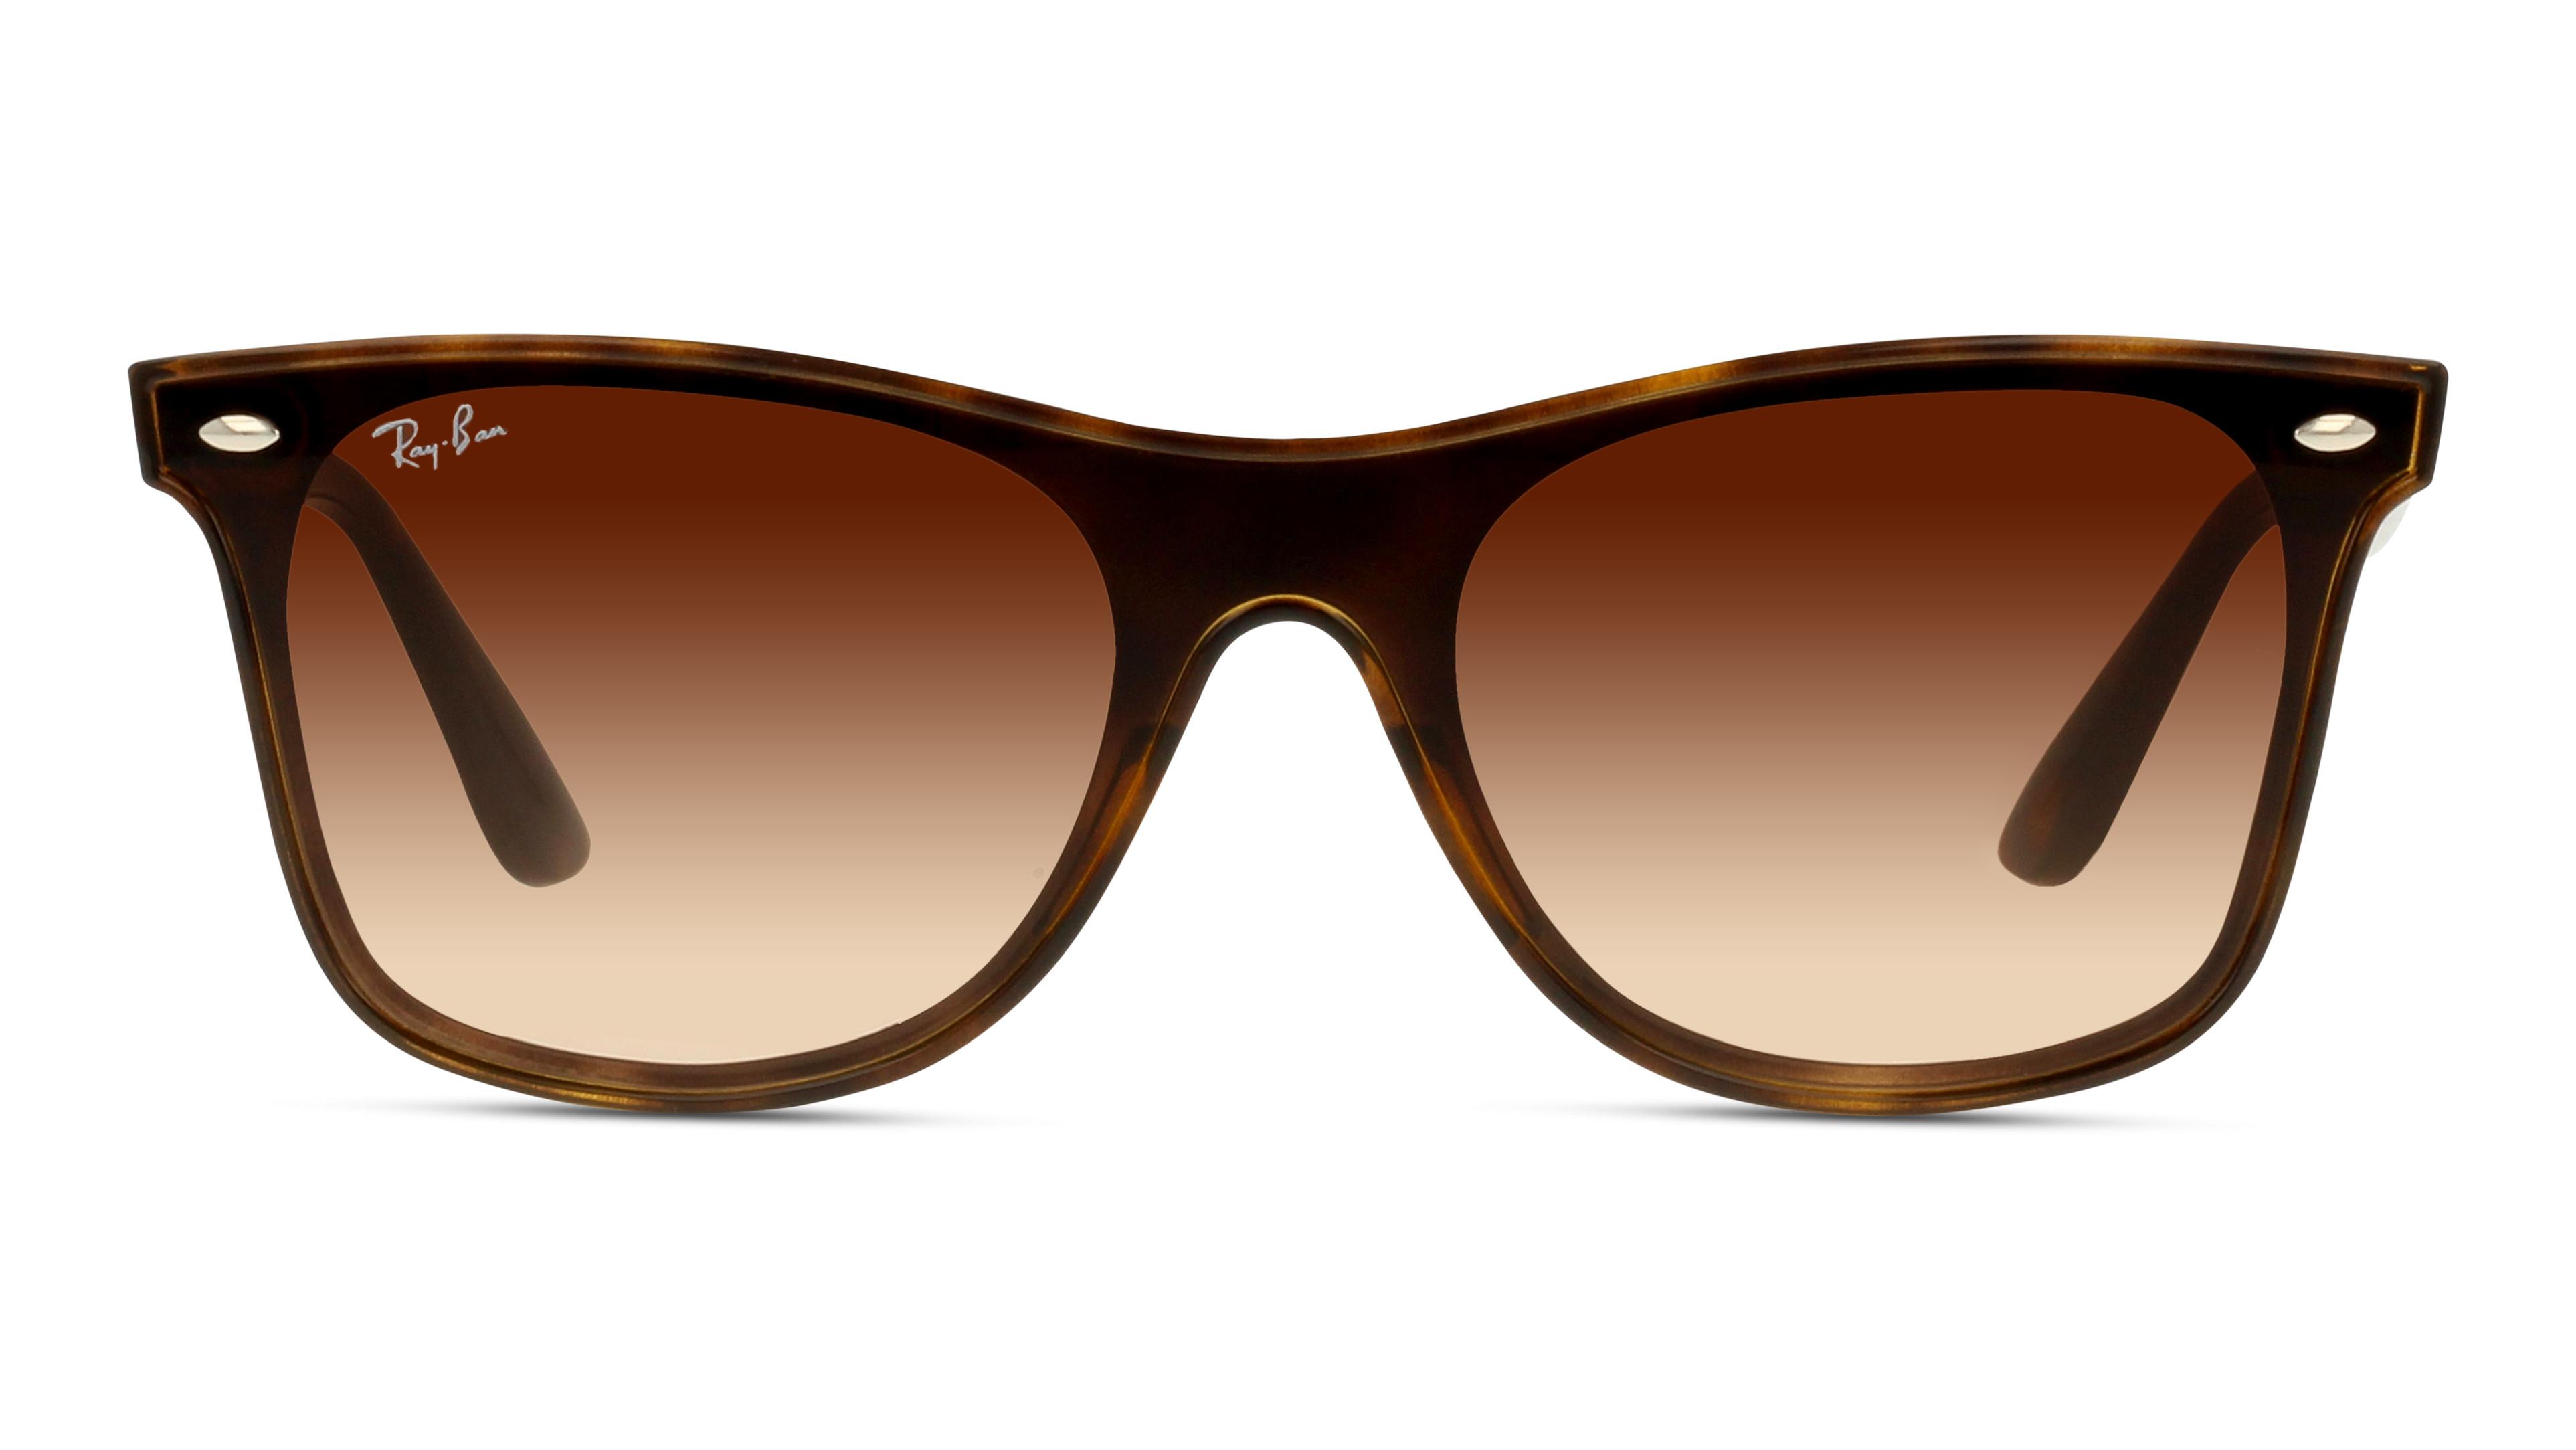 8053672919066-front-01-rayban-rb4440n-eyewear-light-havana